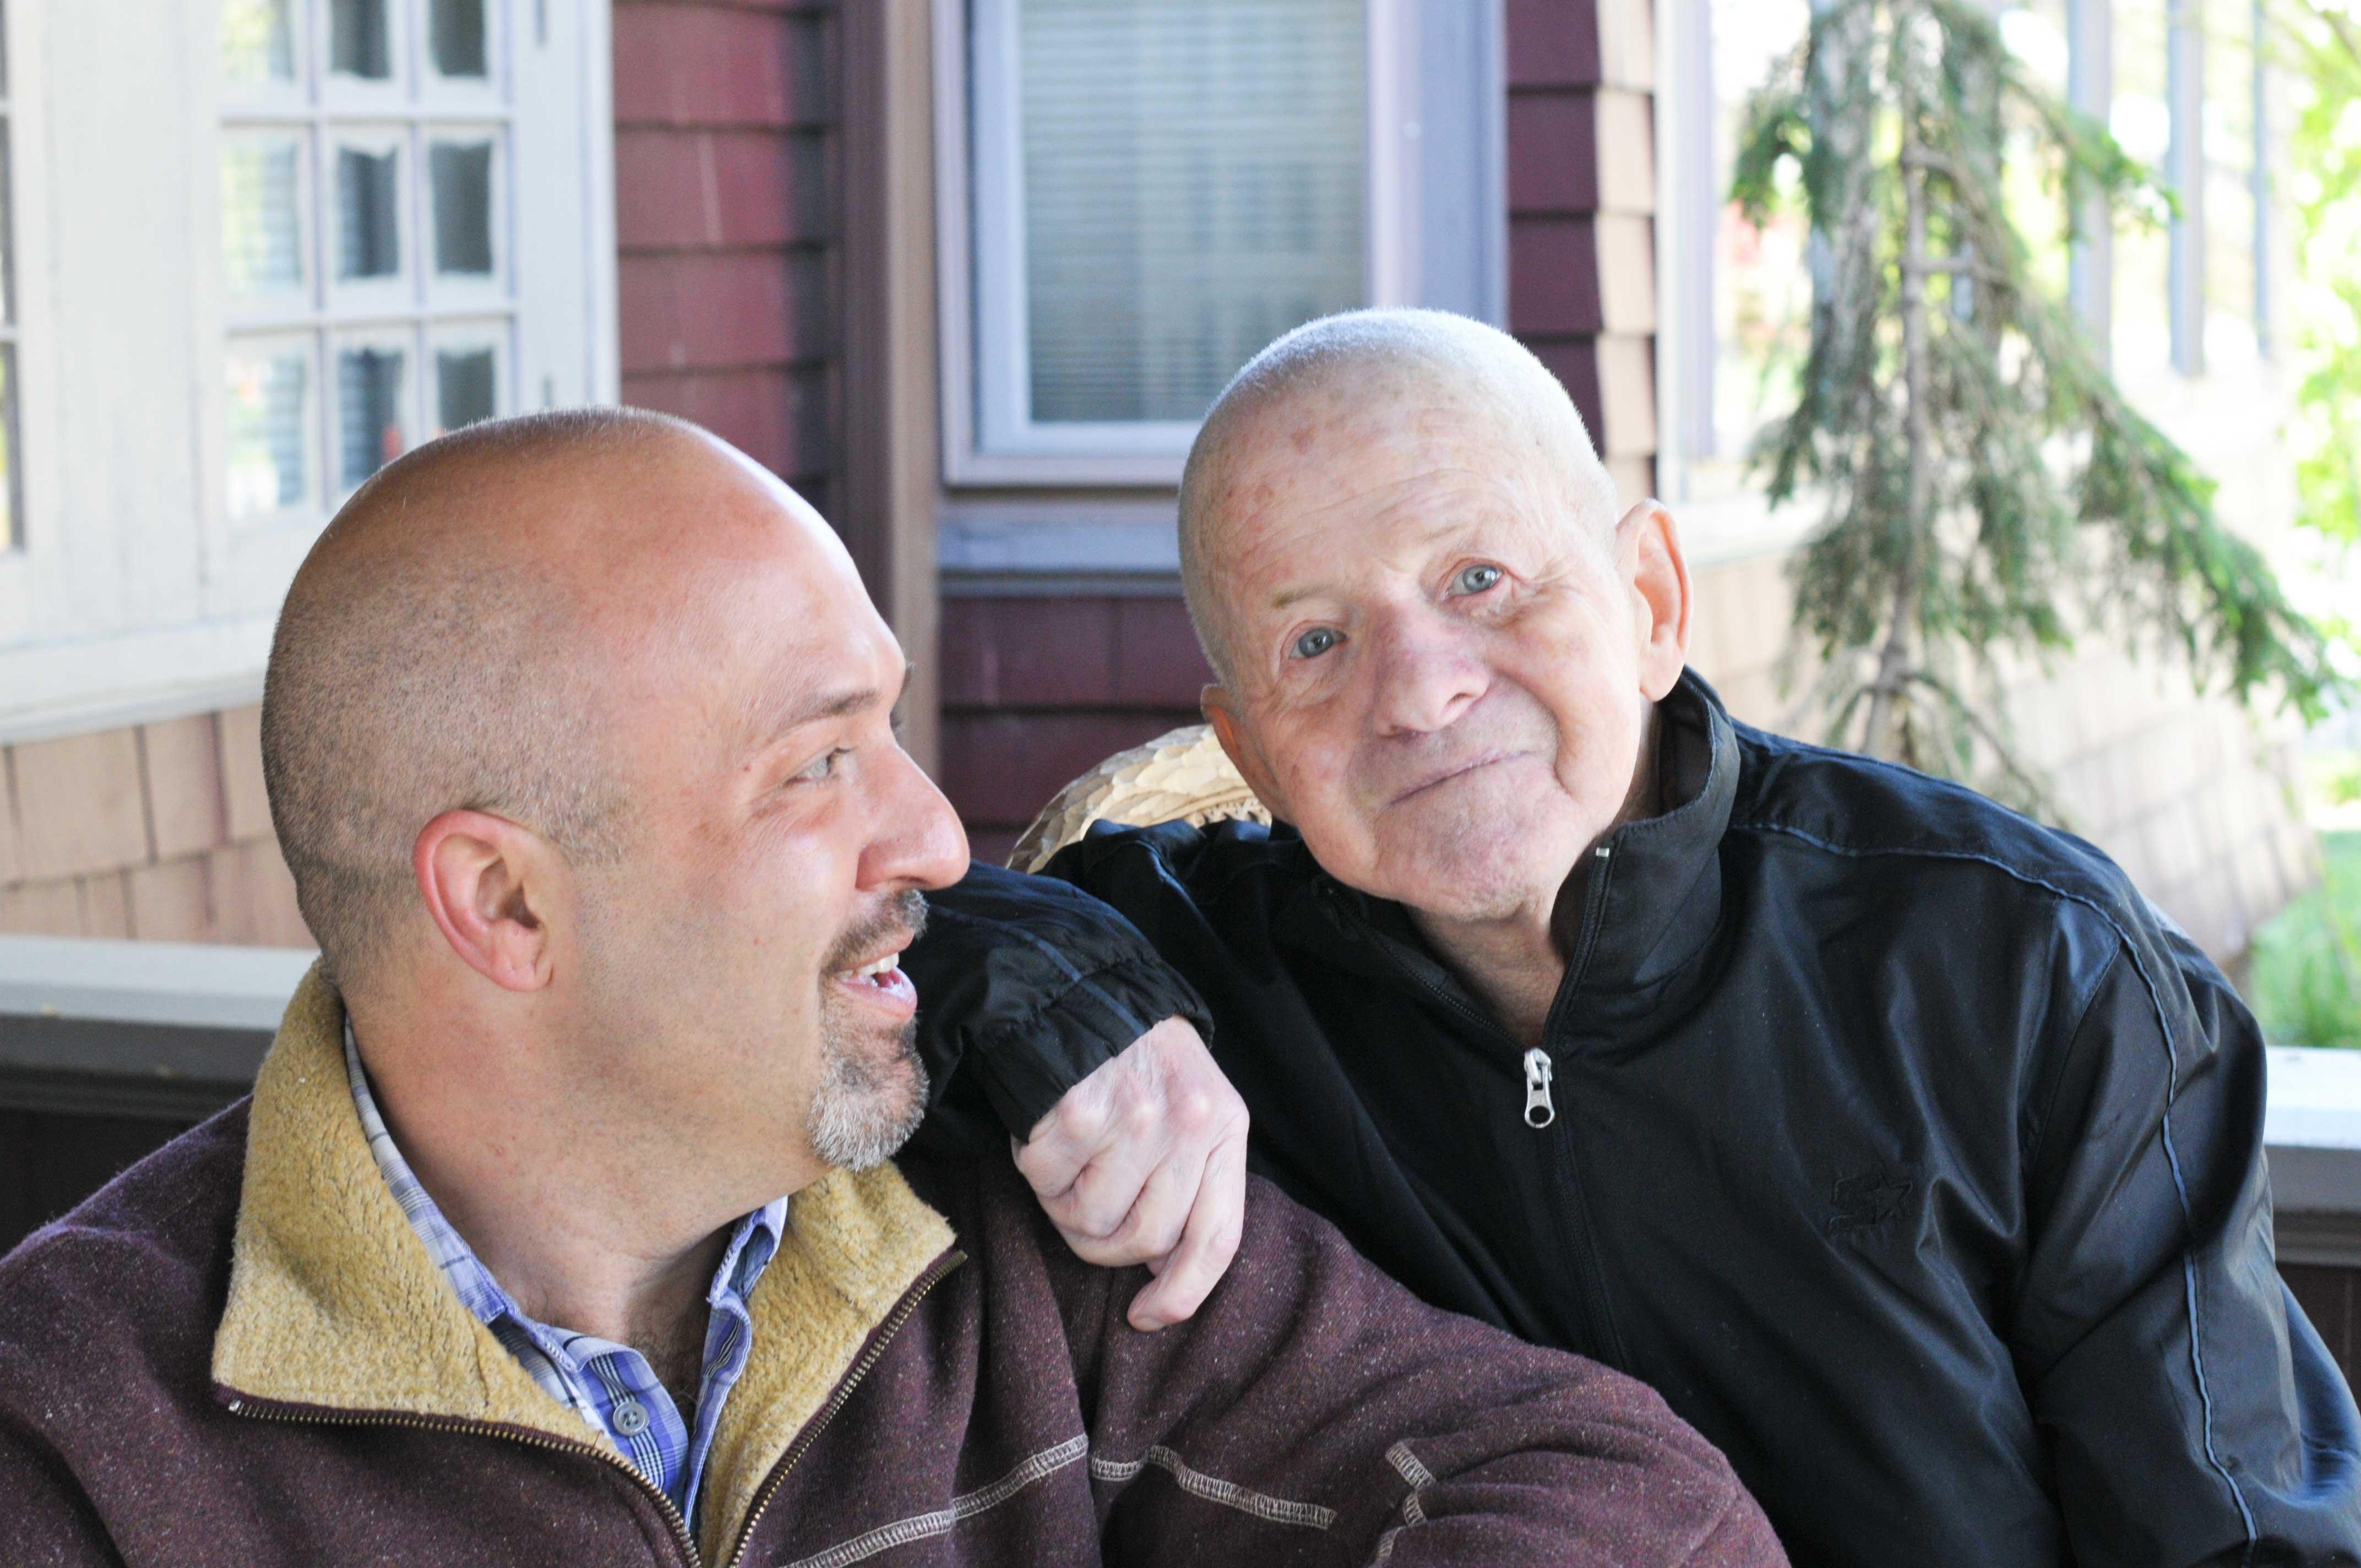 jerrod-looking-at-bill-looking-at-camera-on-porch